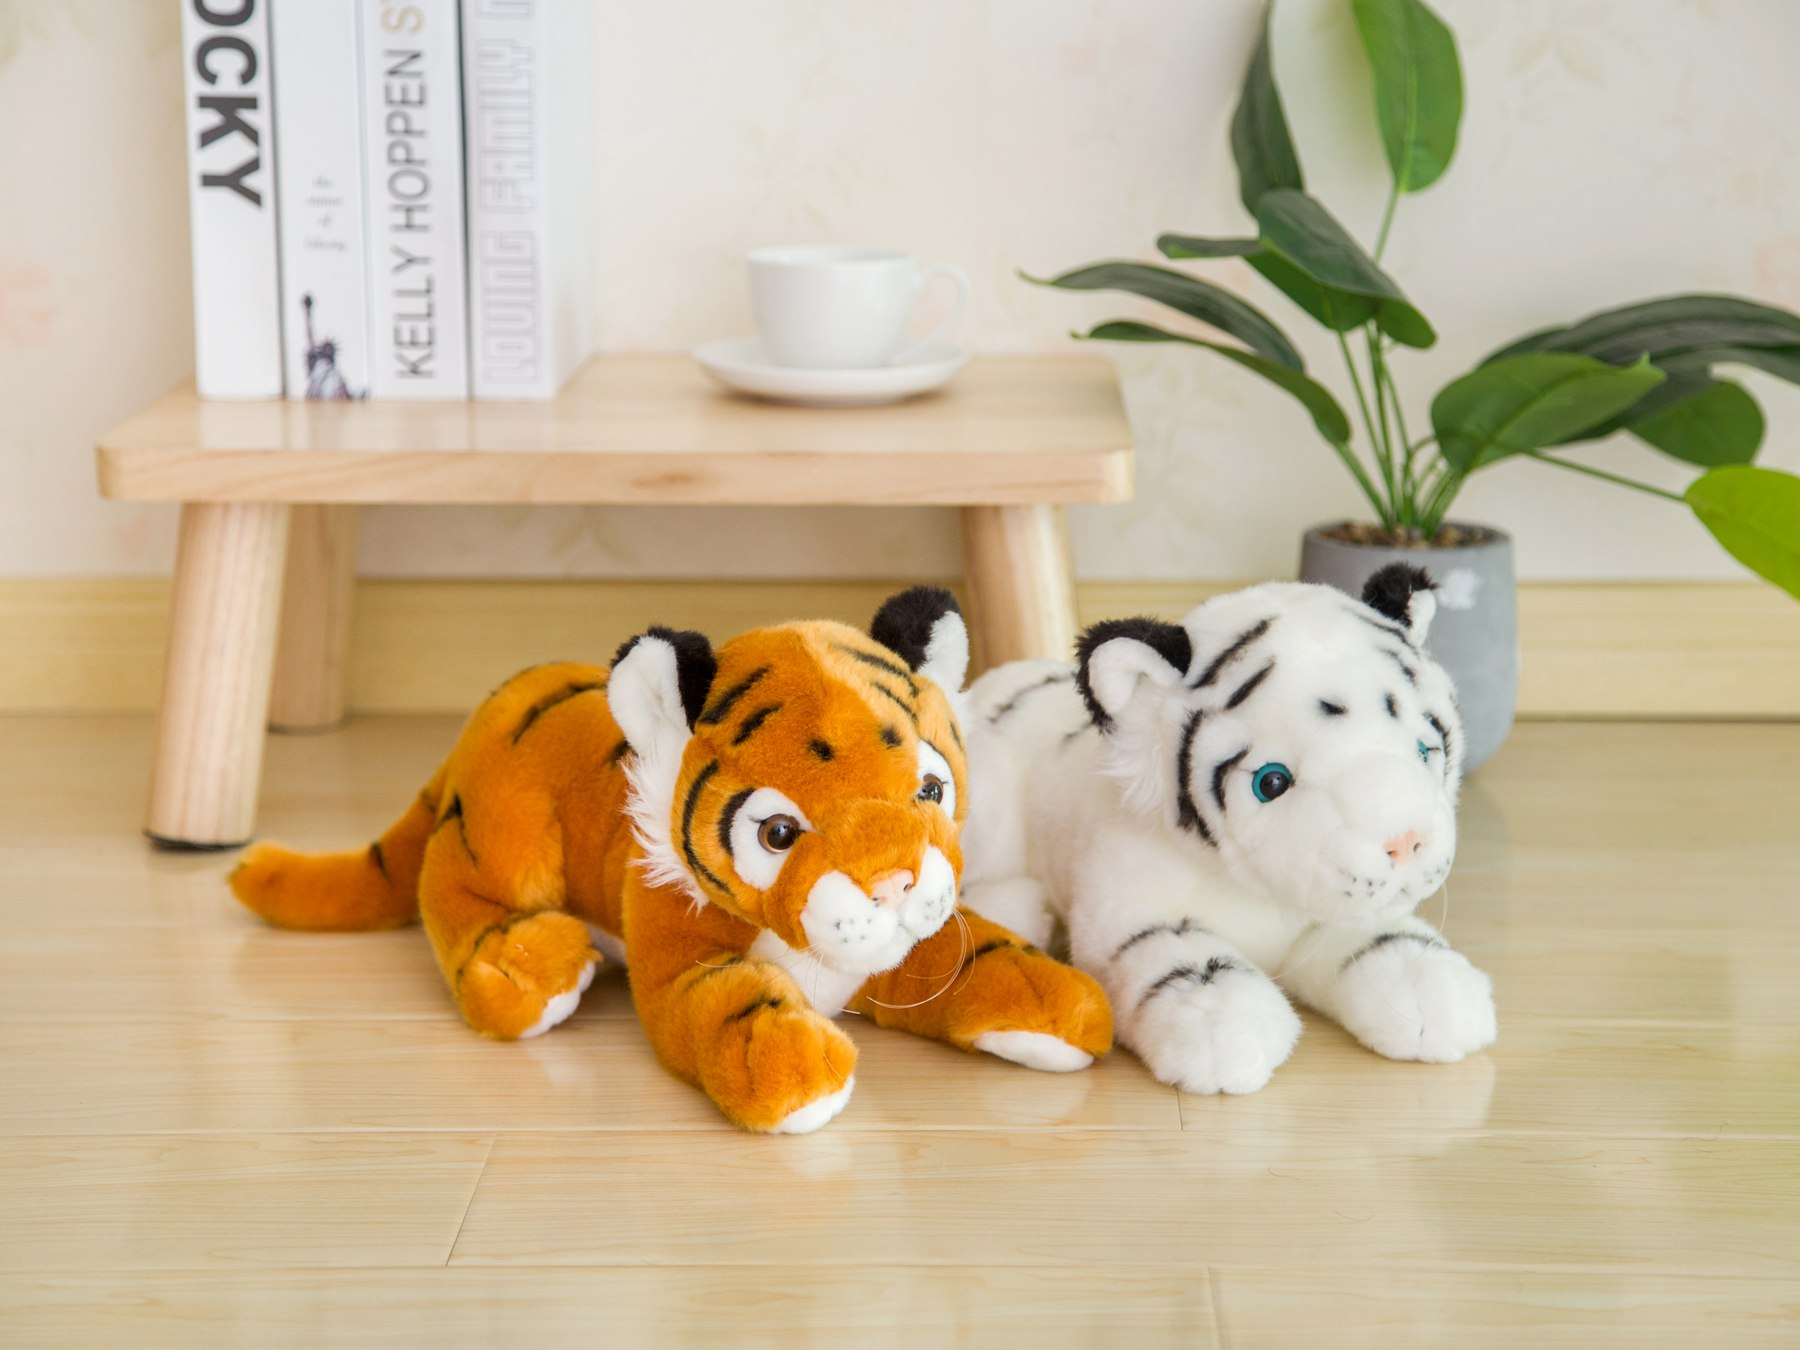 Simulation Leopard Plush Toy Jaguar Soft Stuffed Animals Doll Leopard Kids Gift